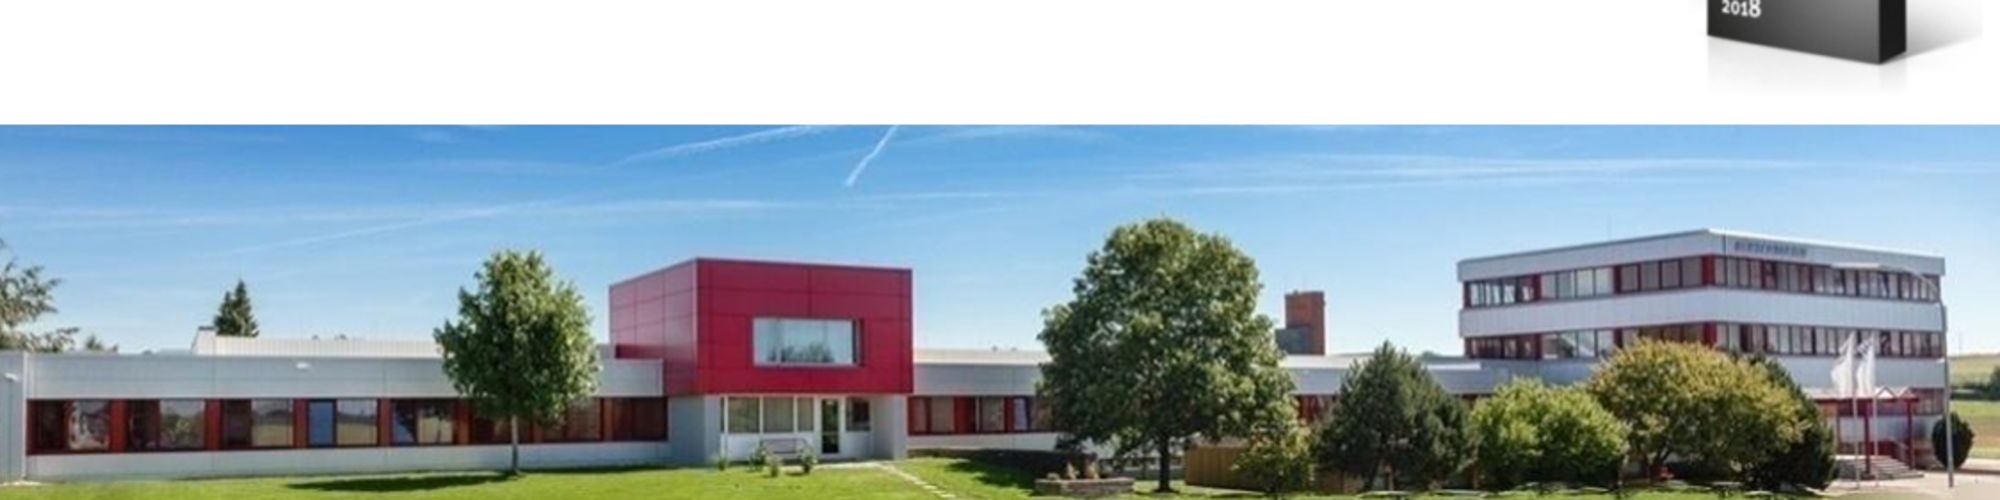 HIRSCHMANN GmbH